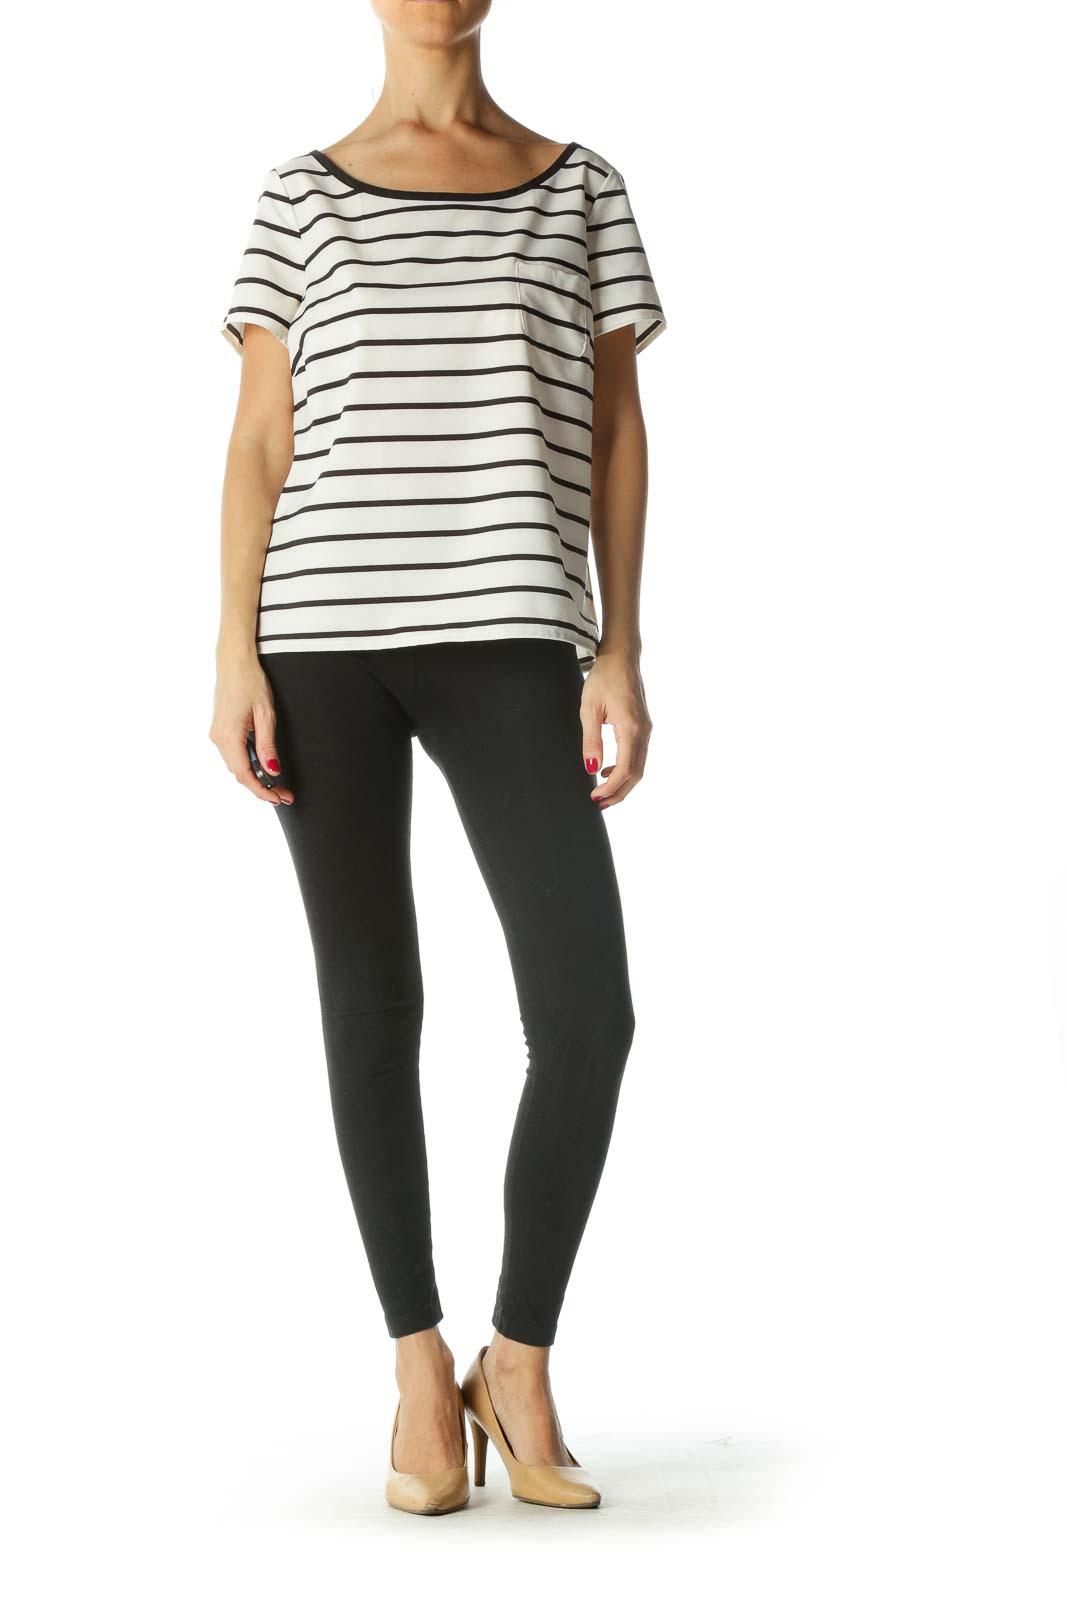 Black Cream Striped Short-Sleeve Top